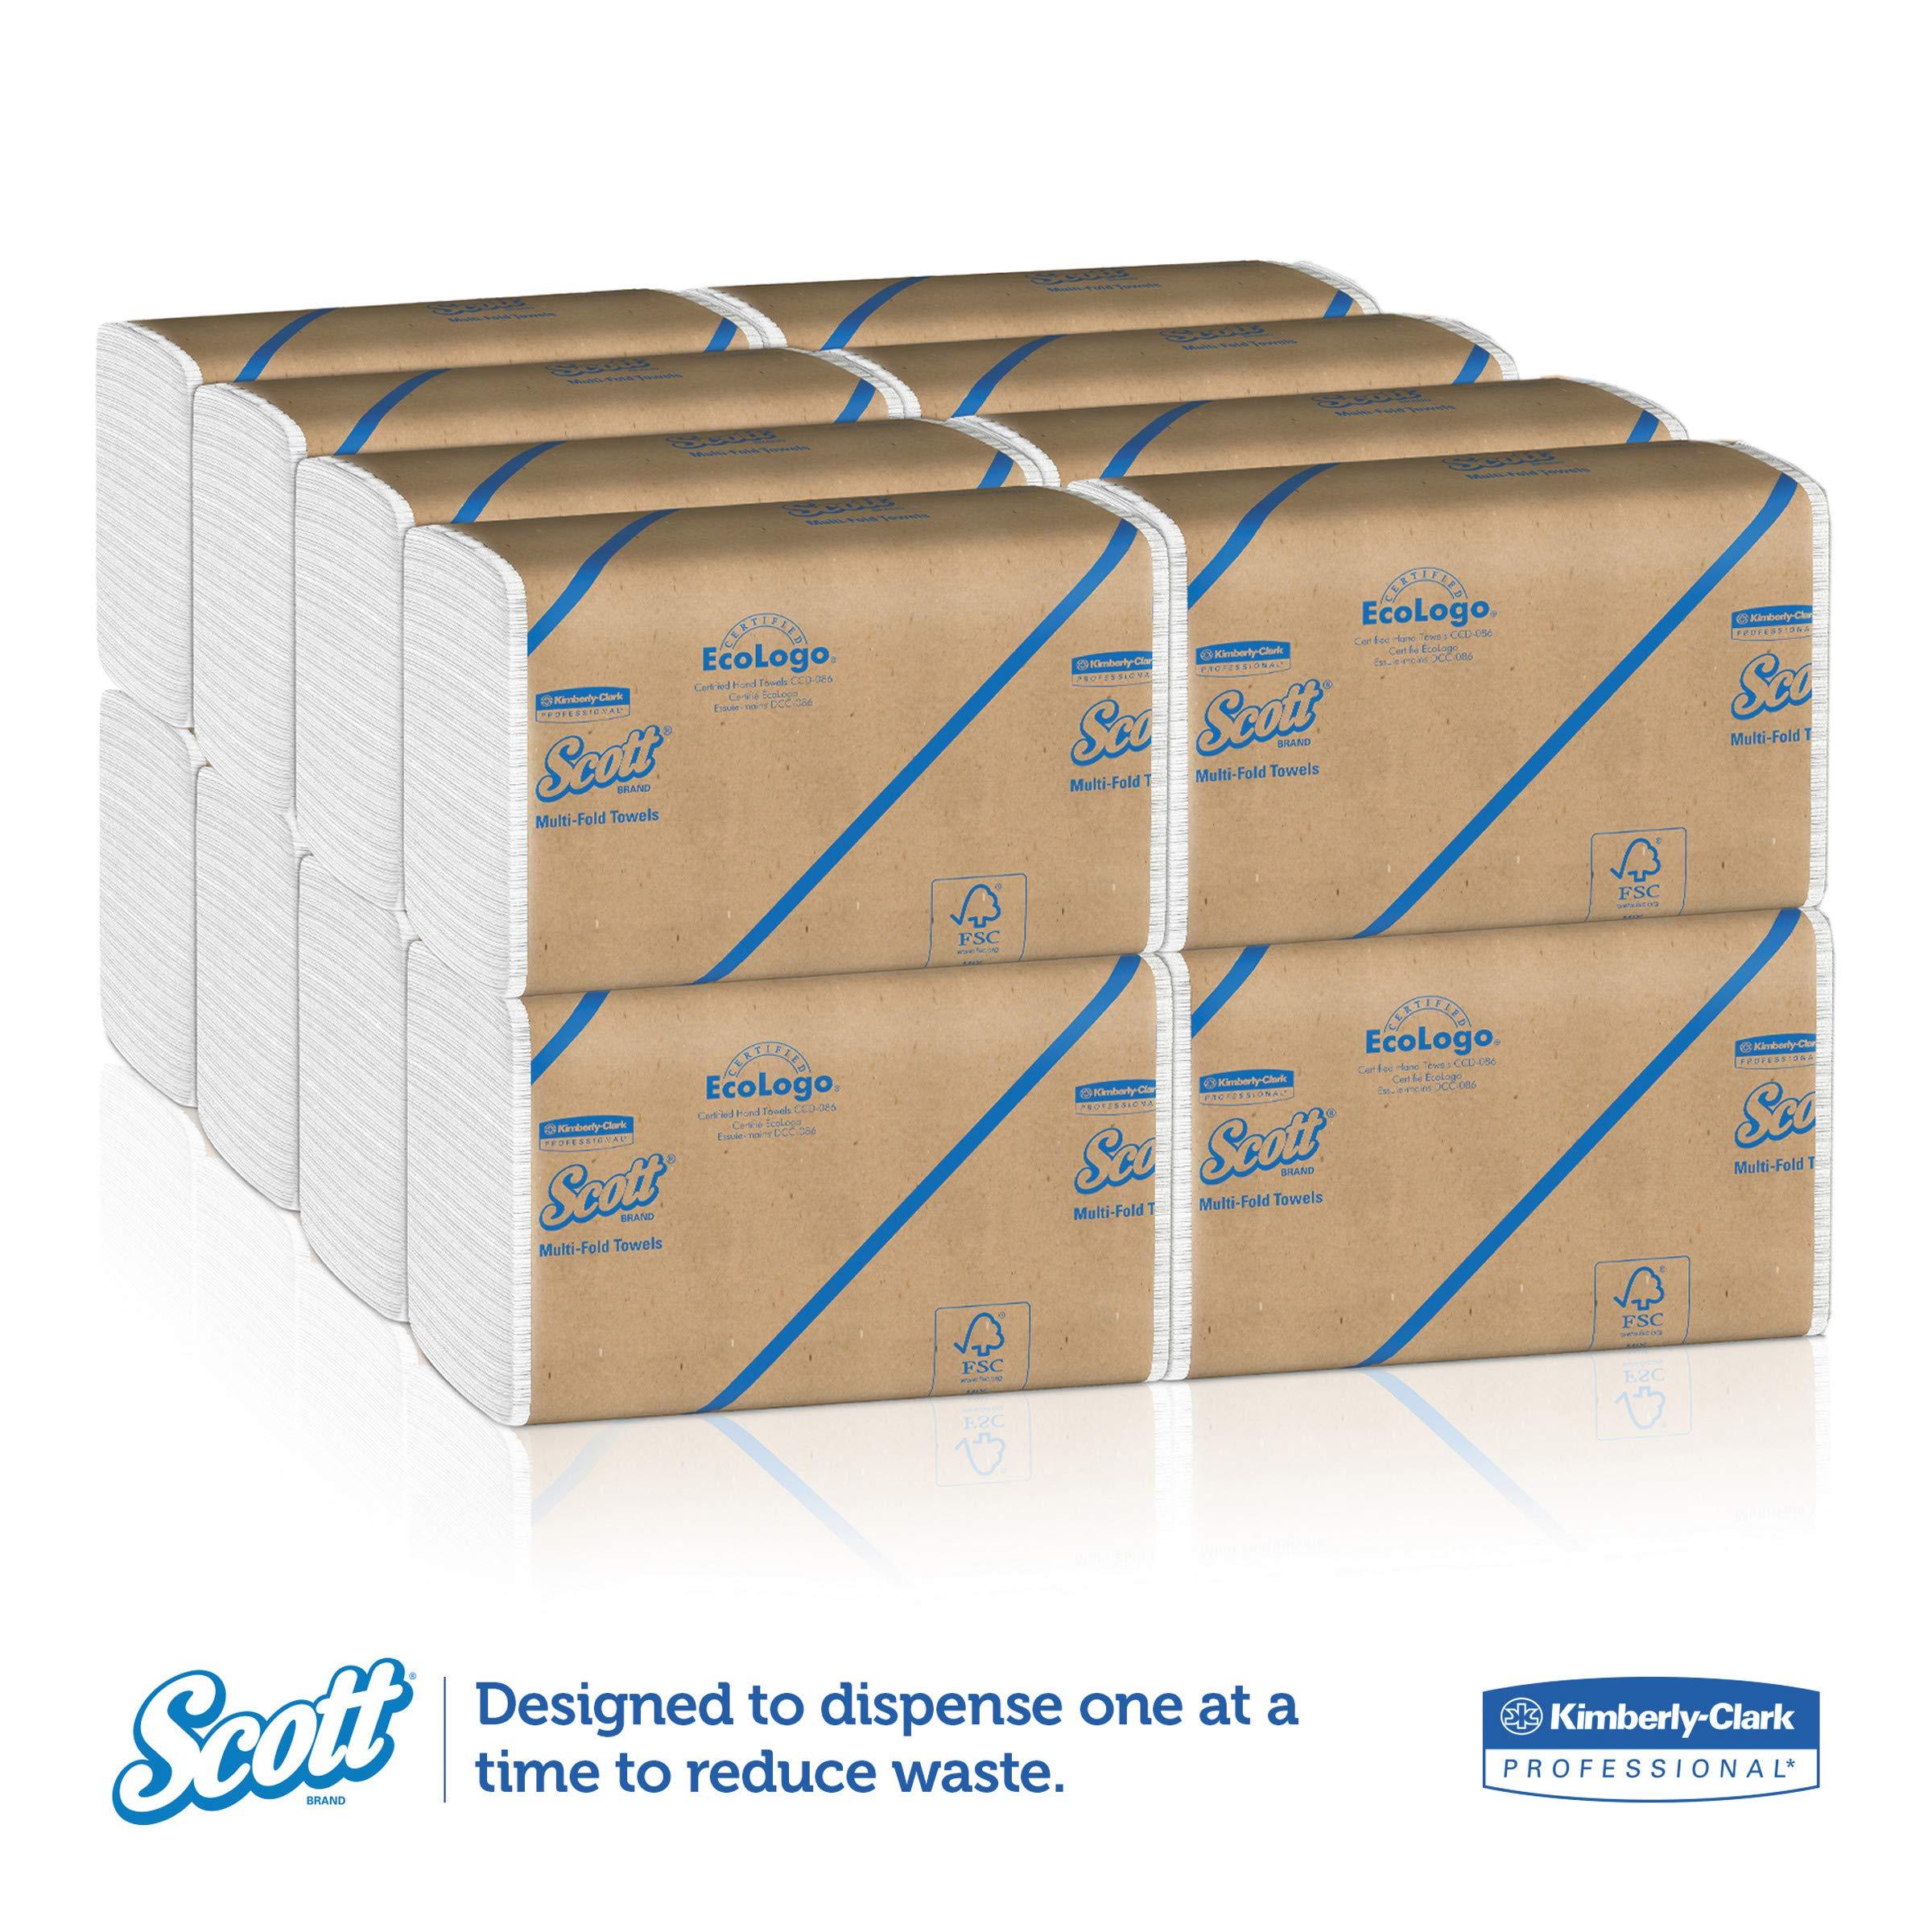 Scott 01840 Multi-Fold Towels, Absorbency Pockets, 9 1/5 x 9 2/5, 250 per Pack (Case of 16 Packs) by Scott (Image #3)